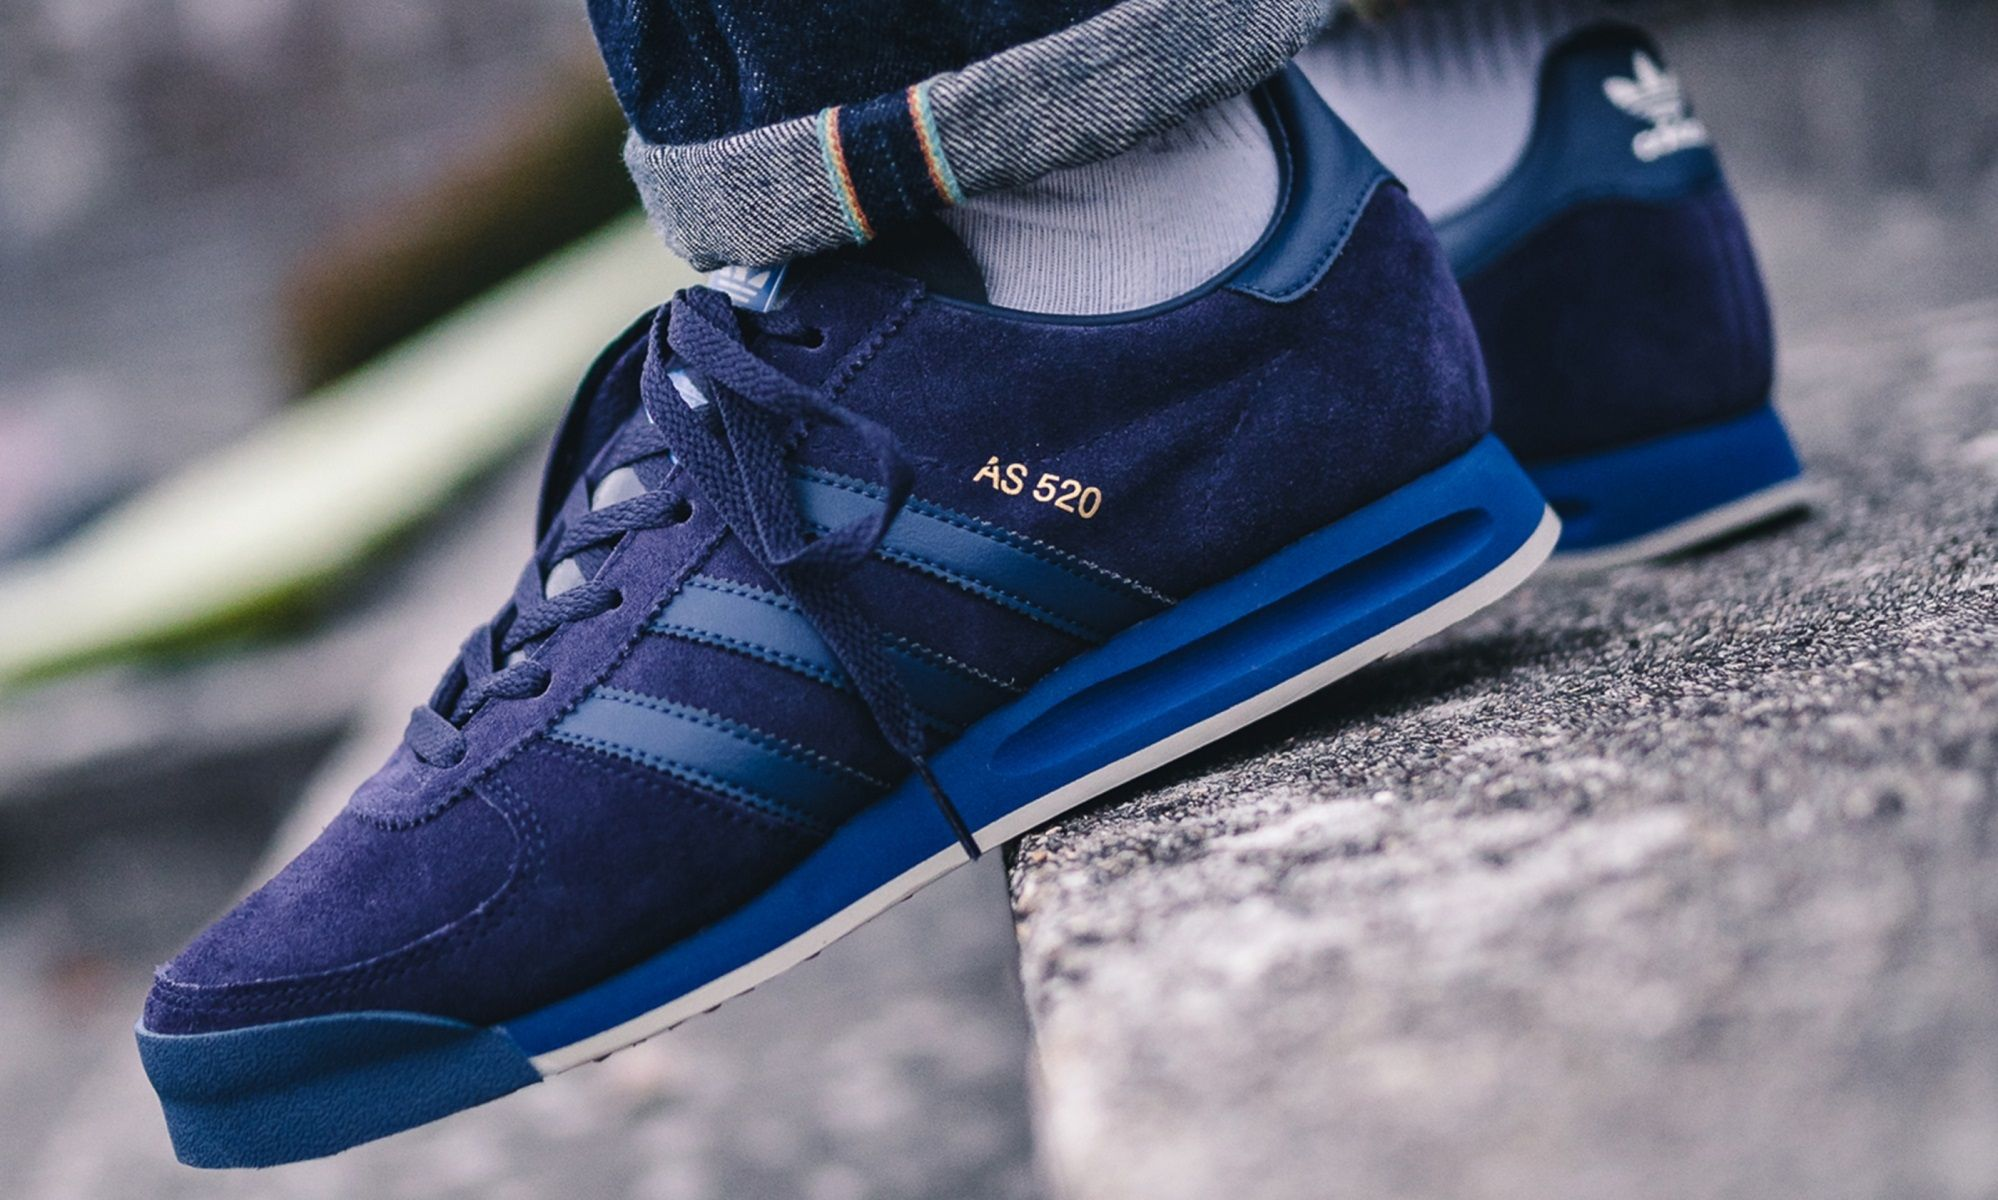 adidas Originals AS 520 SPZL | Sneakers